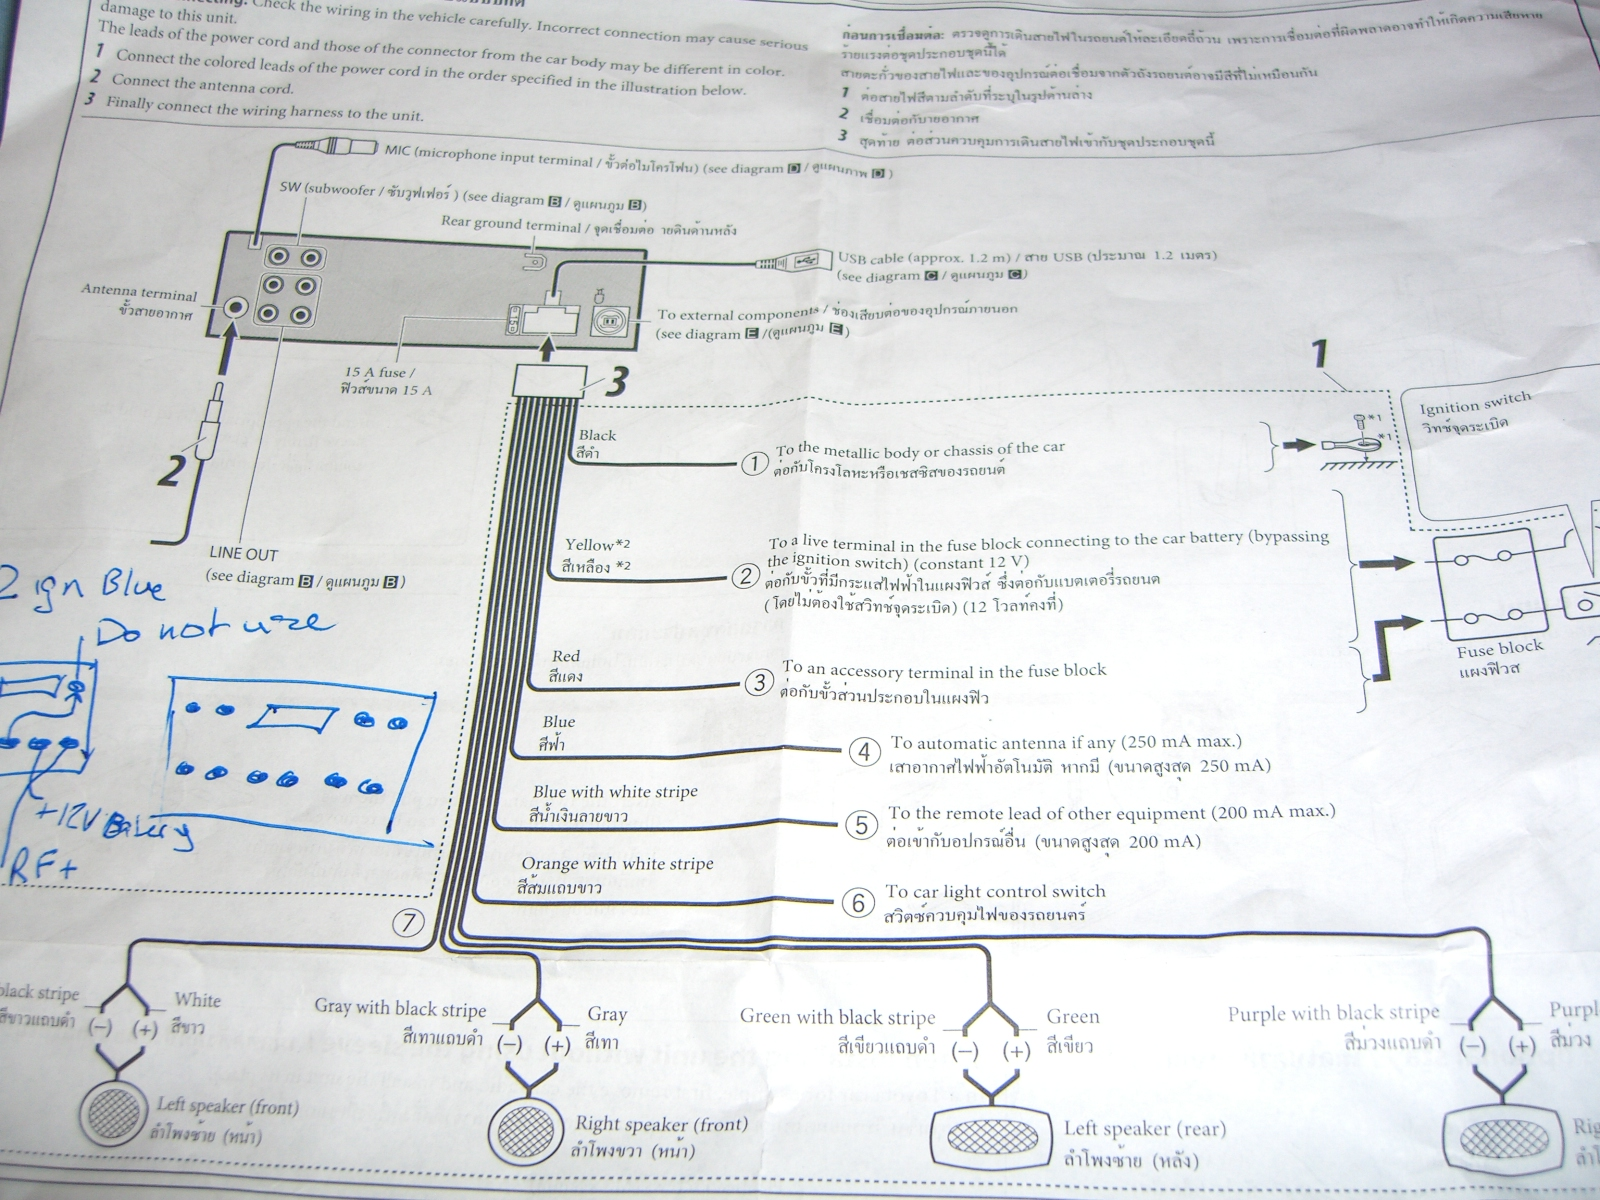 Wiring Diagram For Nissan Stagea : R audio wiring car security sau community